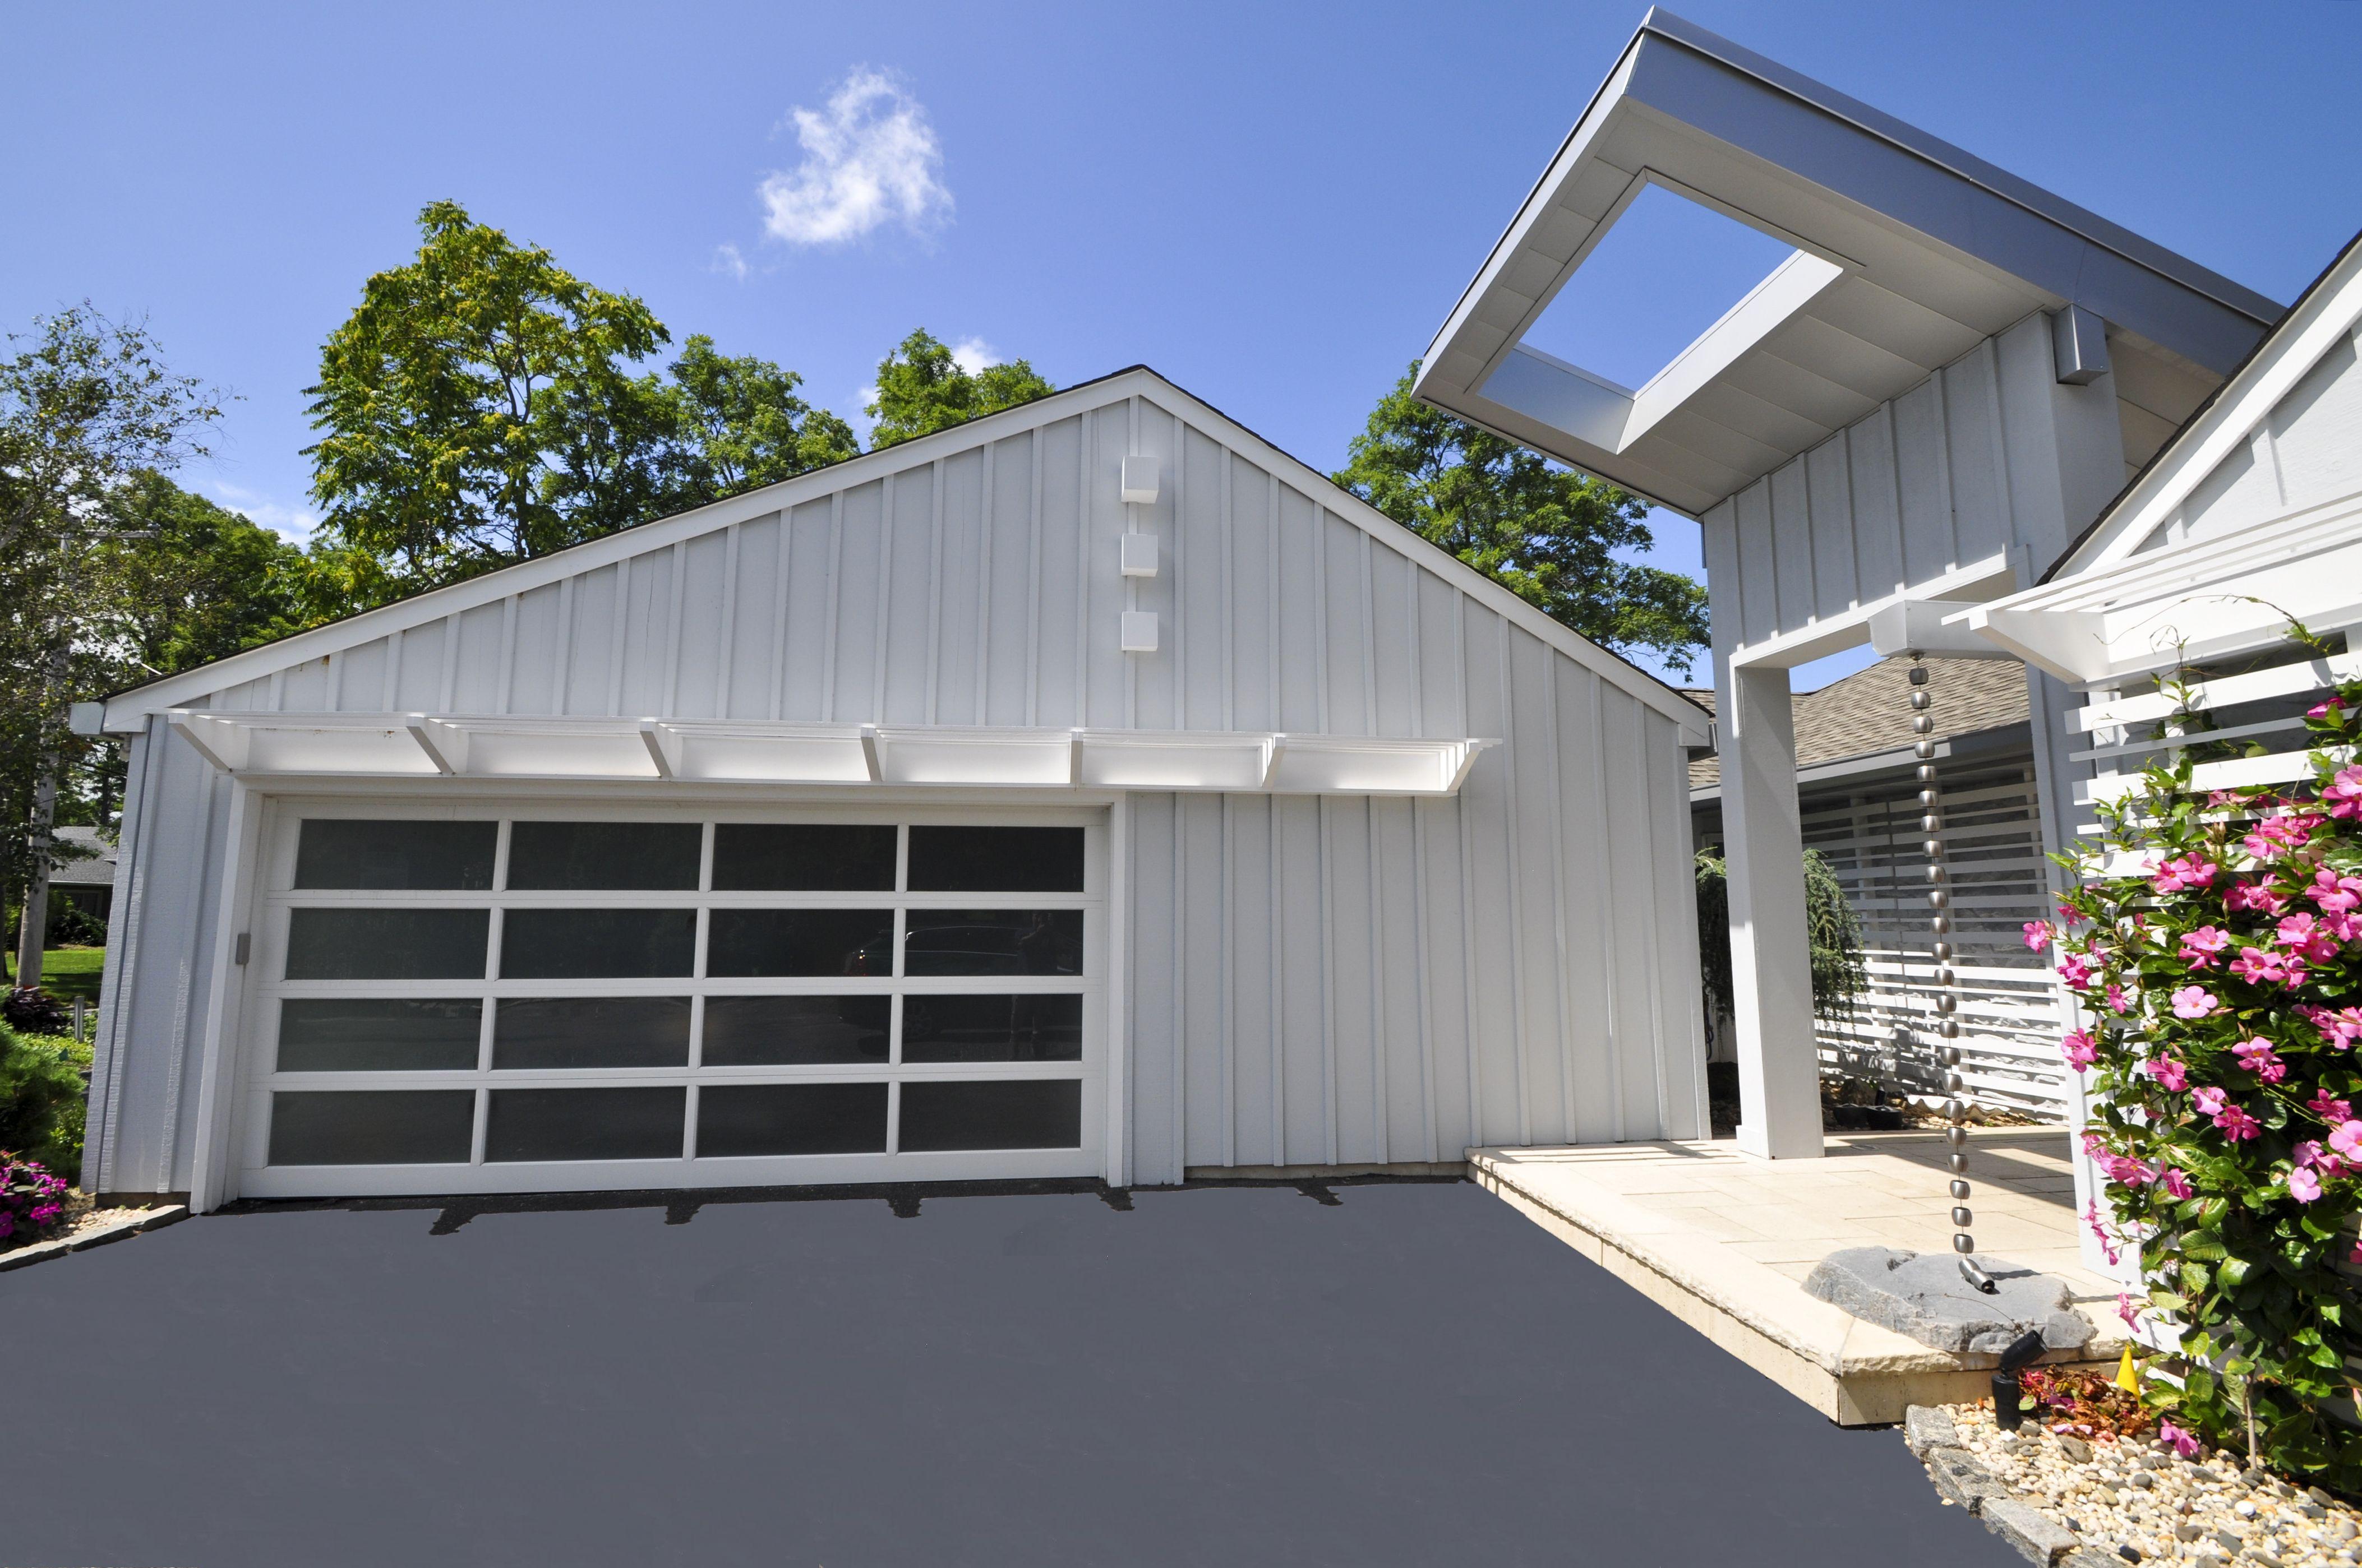 Black Modern Garage Door With Windows Porte De Garage Noire Avec